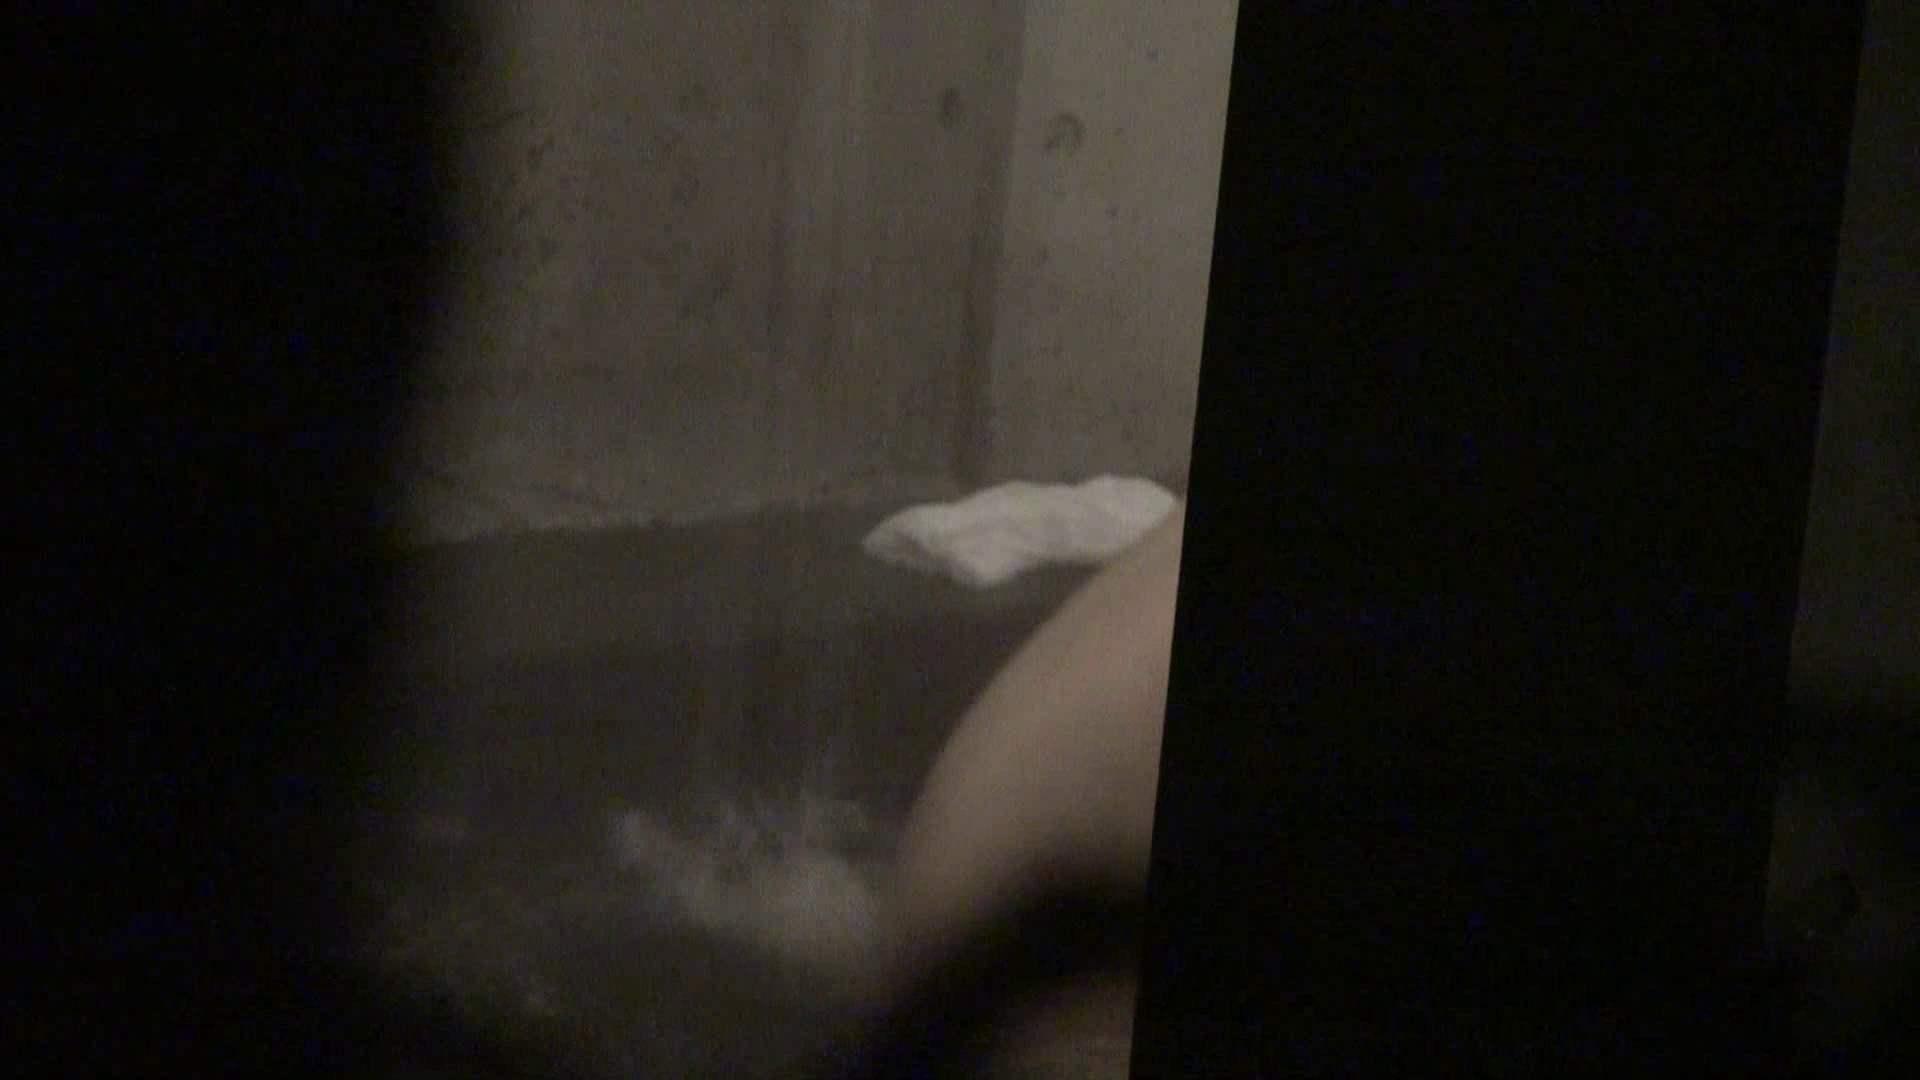 Aquaな露天風呂Vol.441 エッチな盗撮 性交動画流出 89pic 88